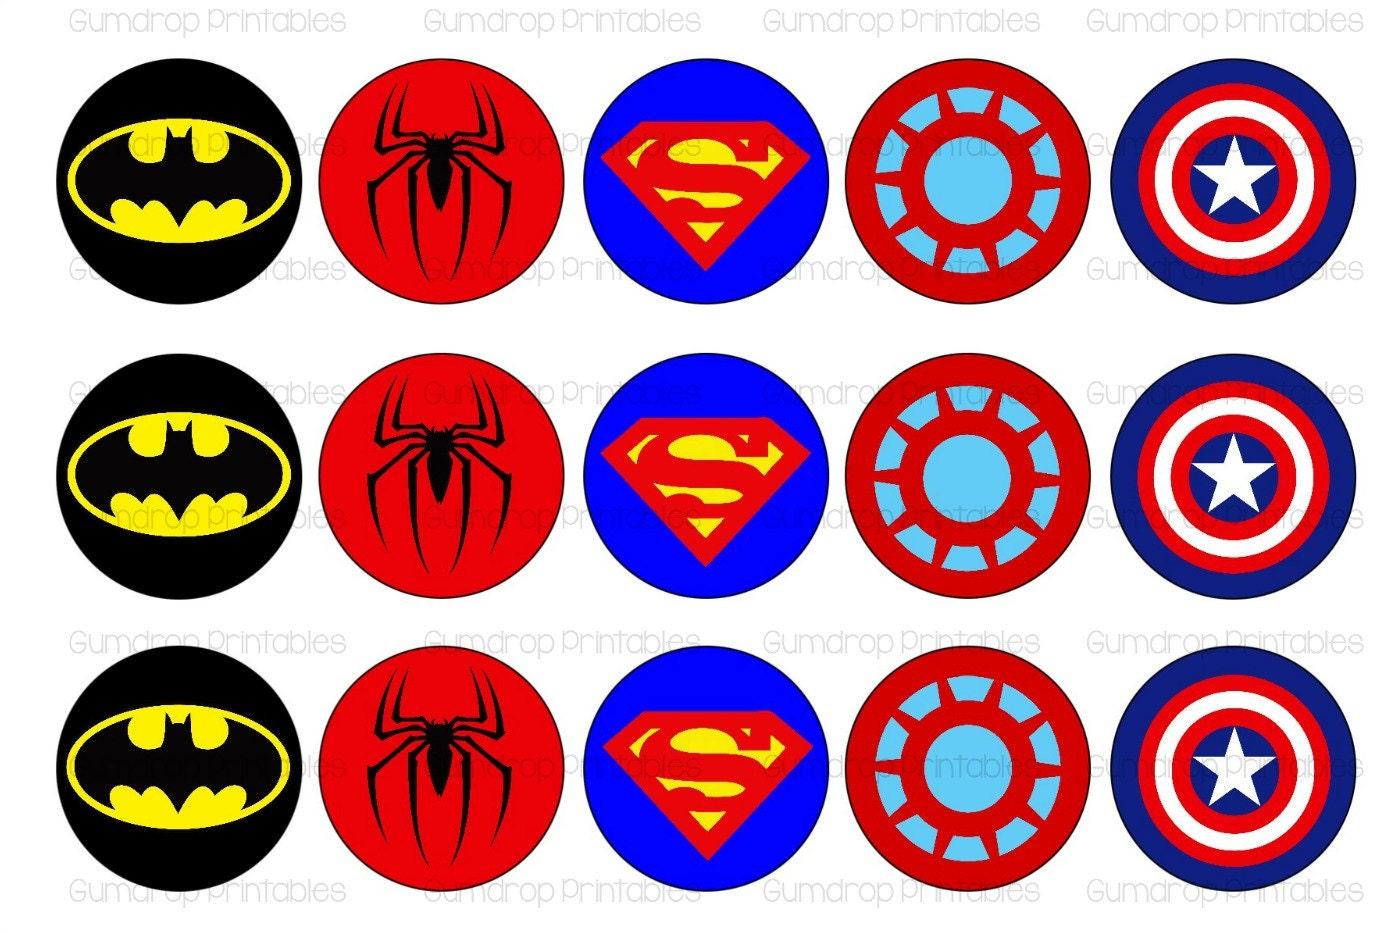 SUPERHERO 2 Logos 1 Inch Circles Bottle Cap Images